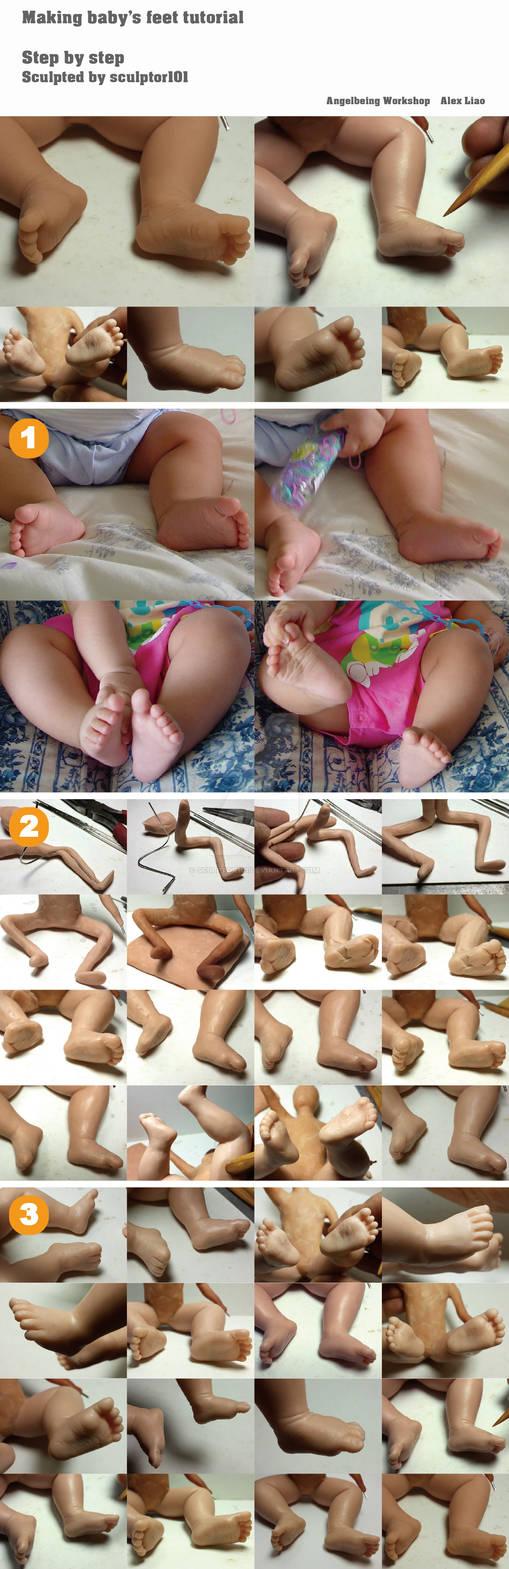 Making baby feet tutorial